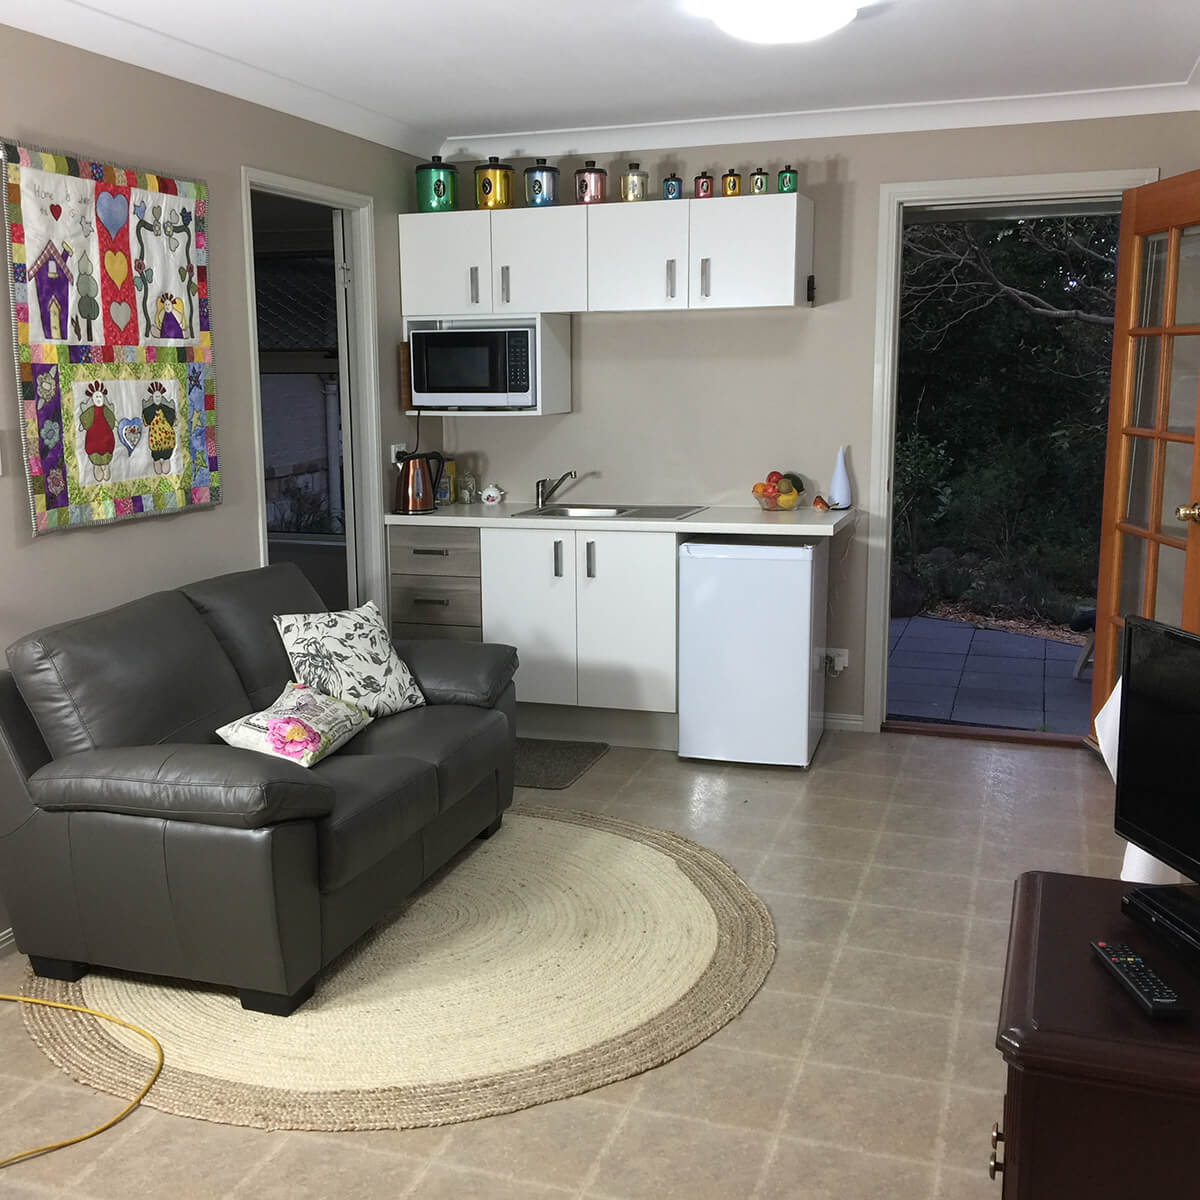 cedar-room-kitchenette